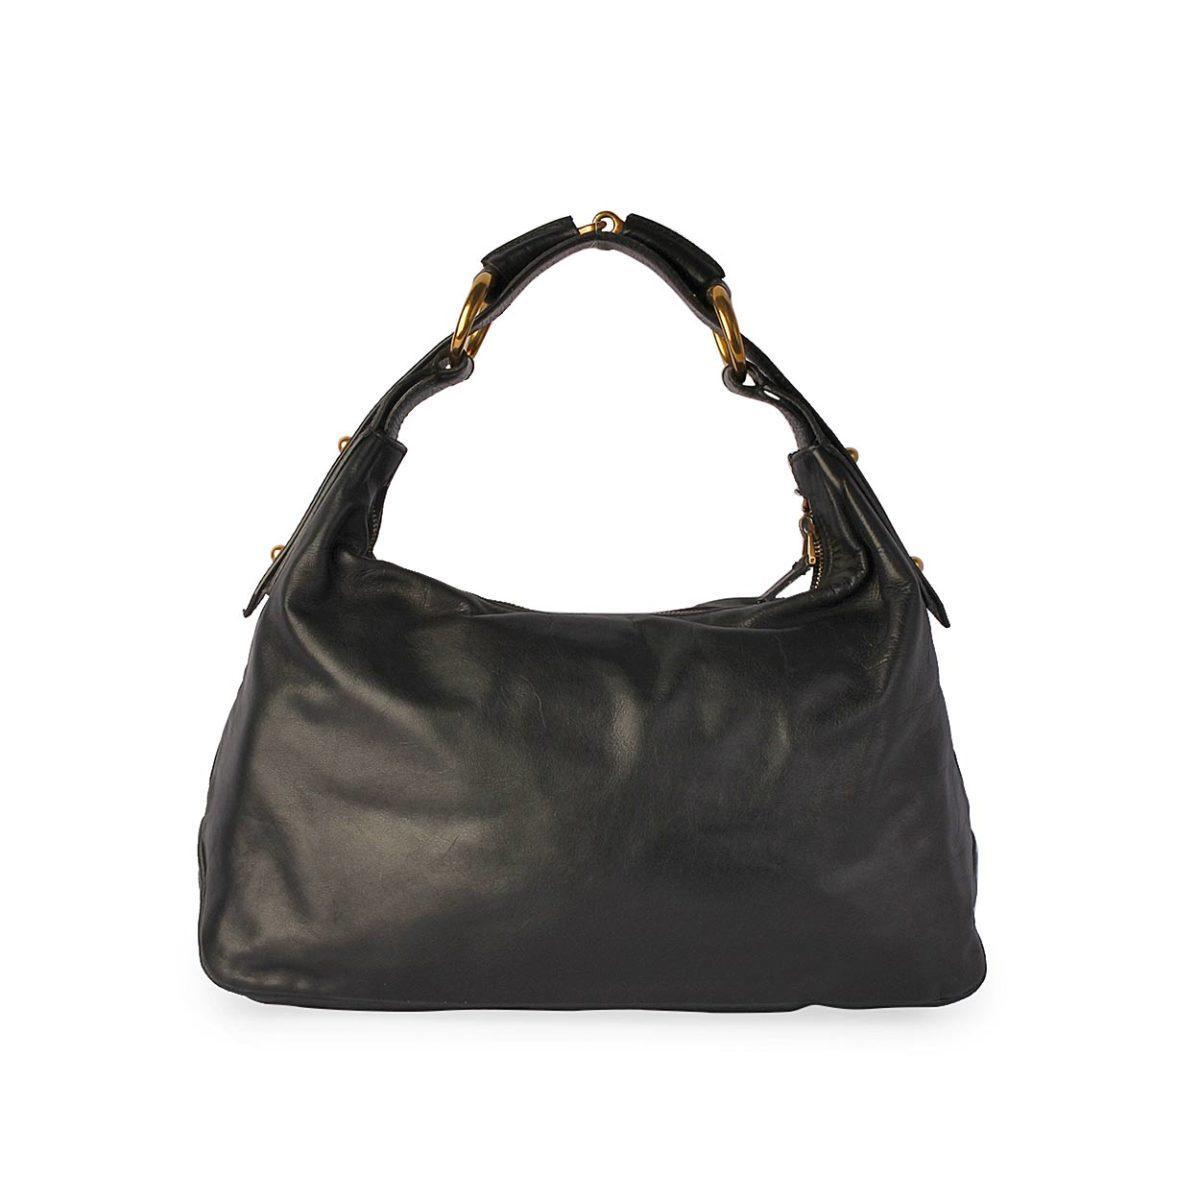 94c396e88646 GUCCI Leather Horsebit Hobo Black